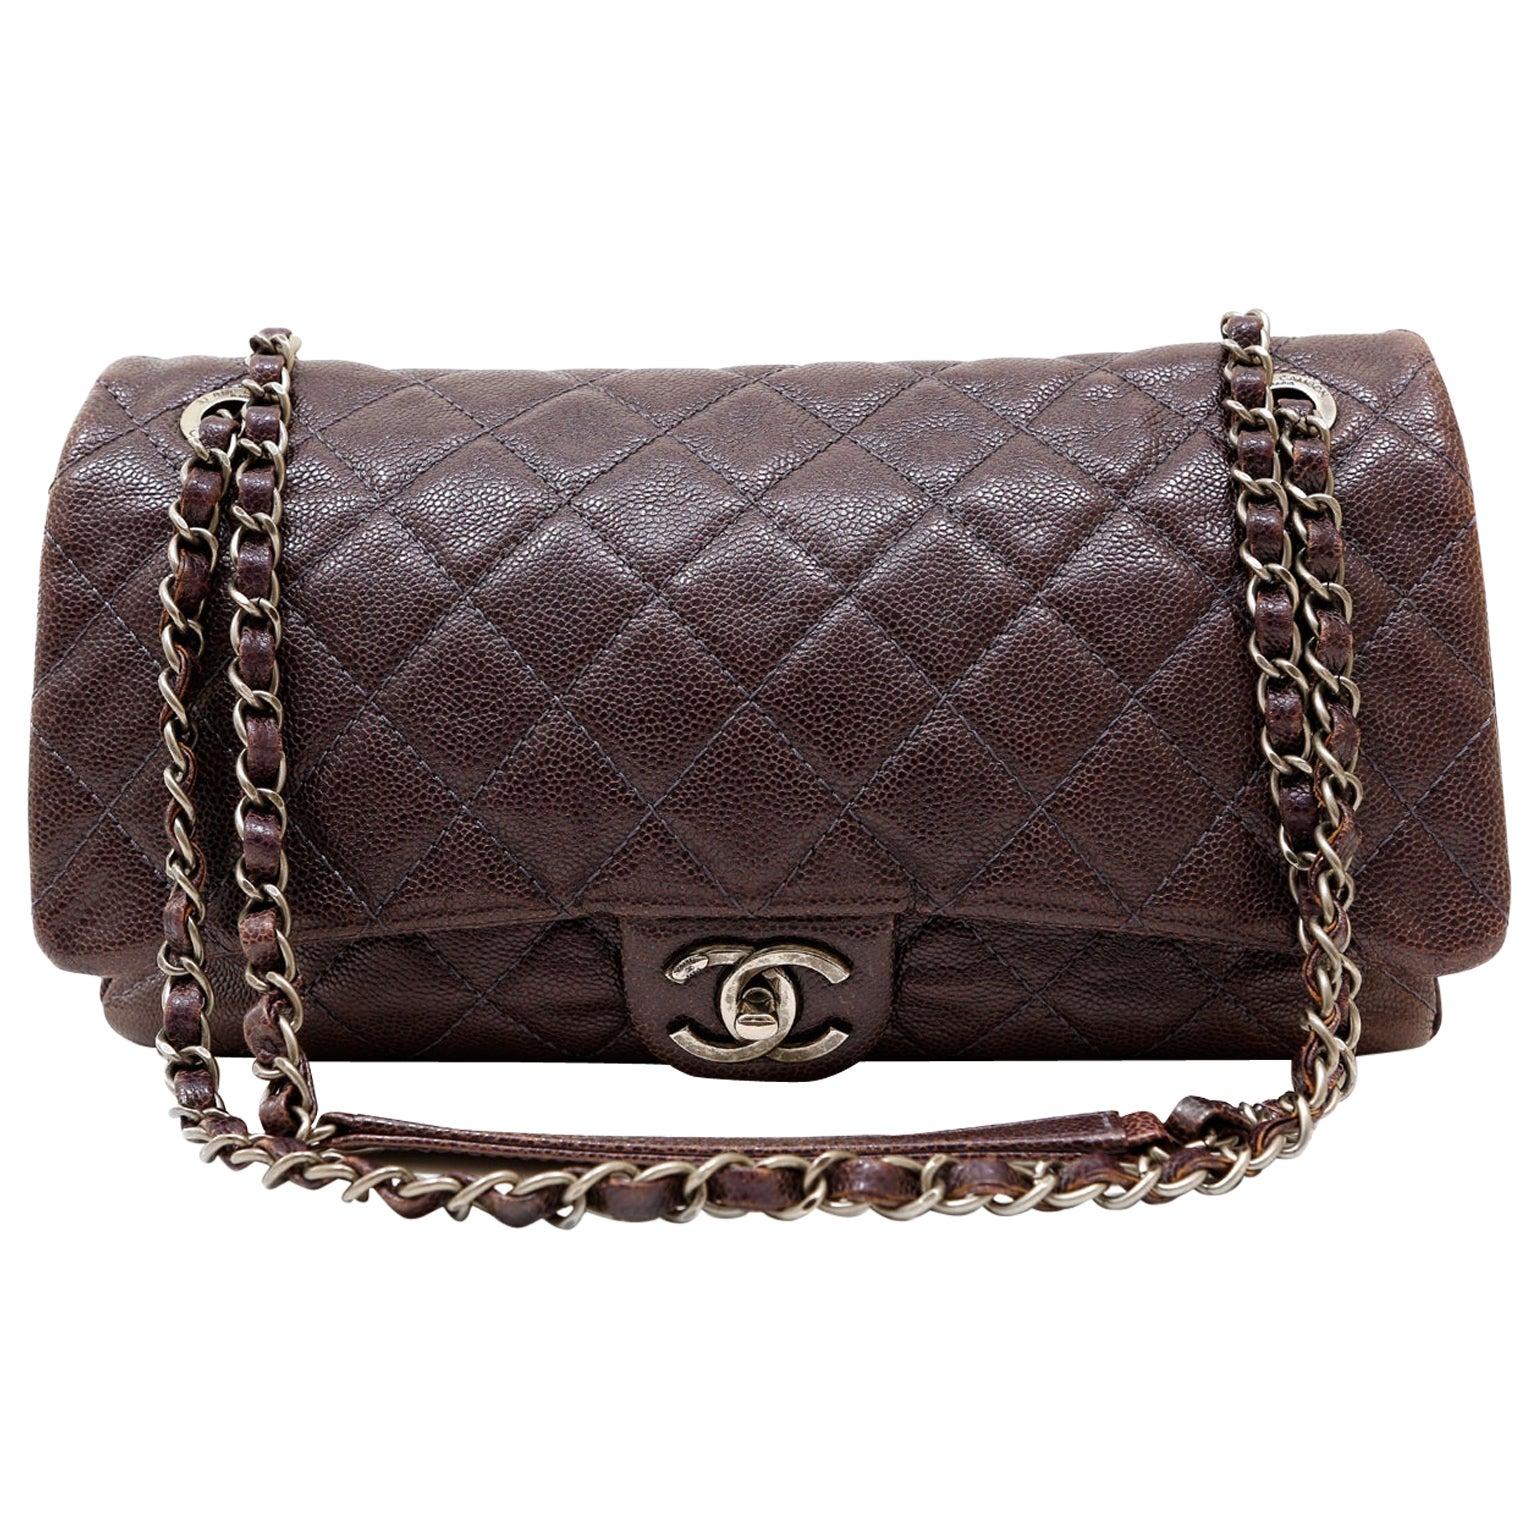 Chanel Purple Caviar Leather Easy Zip Flap Bag